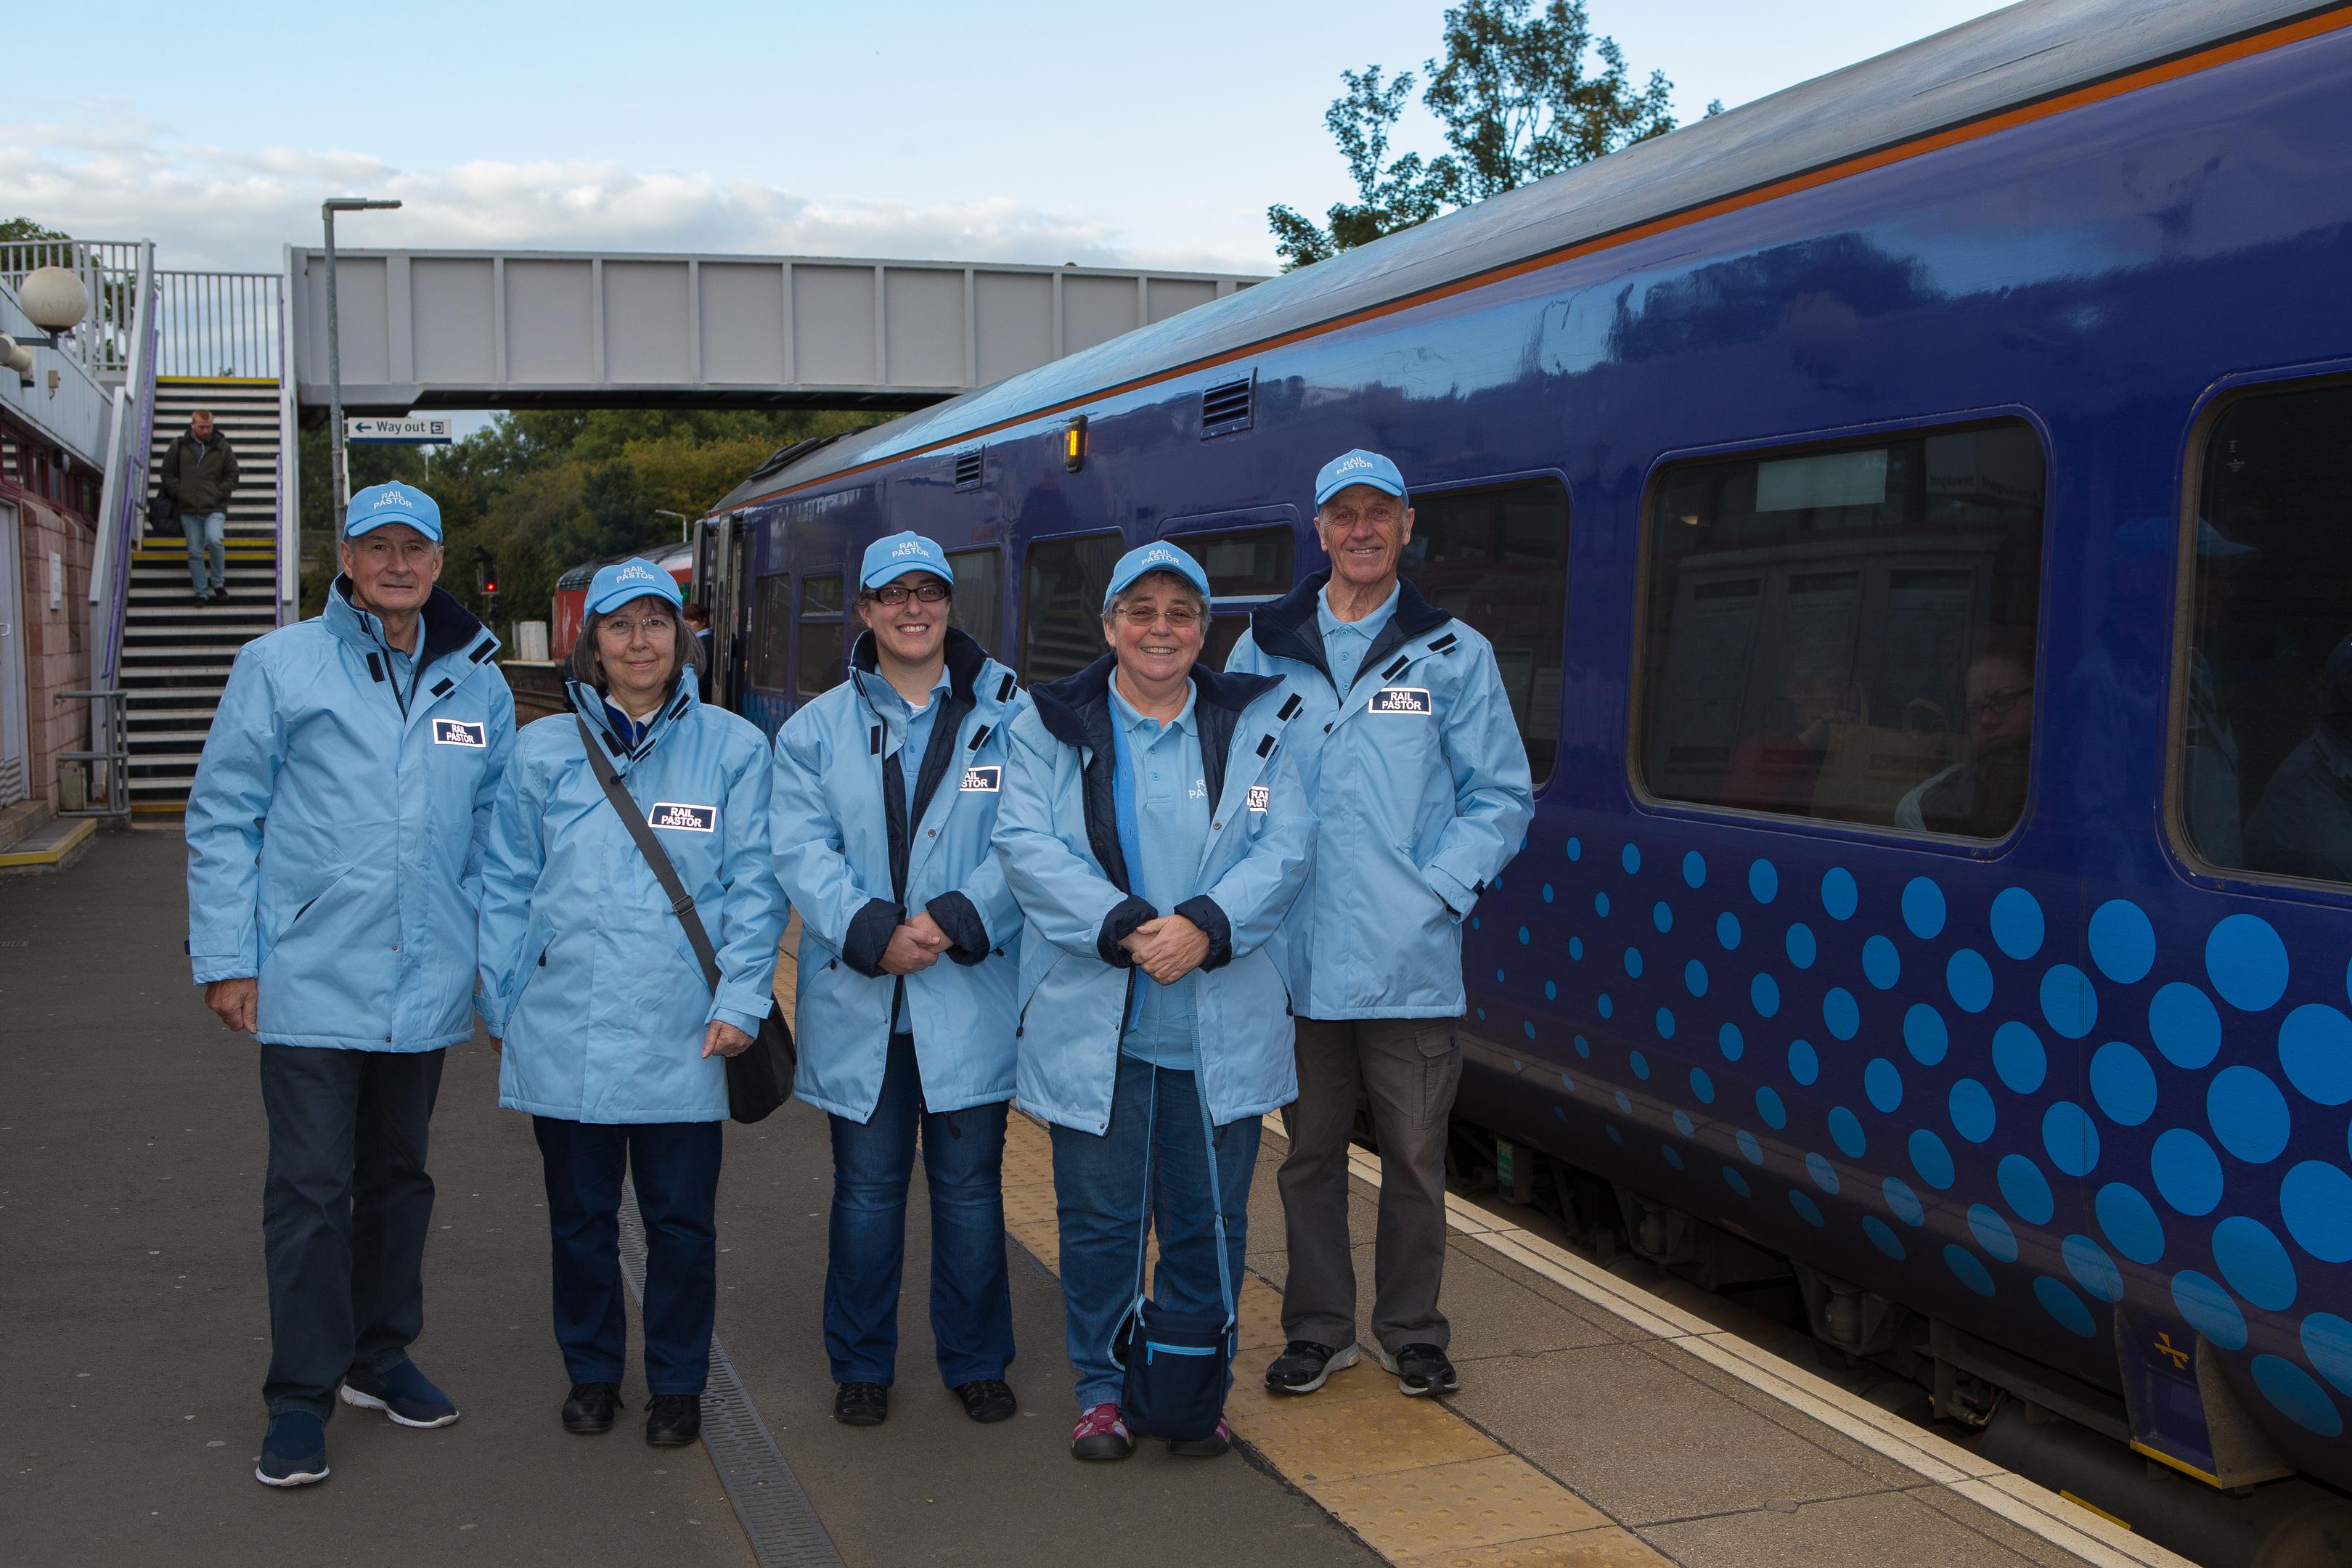 Rail Pastors at Inverkeithing Train Station.